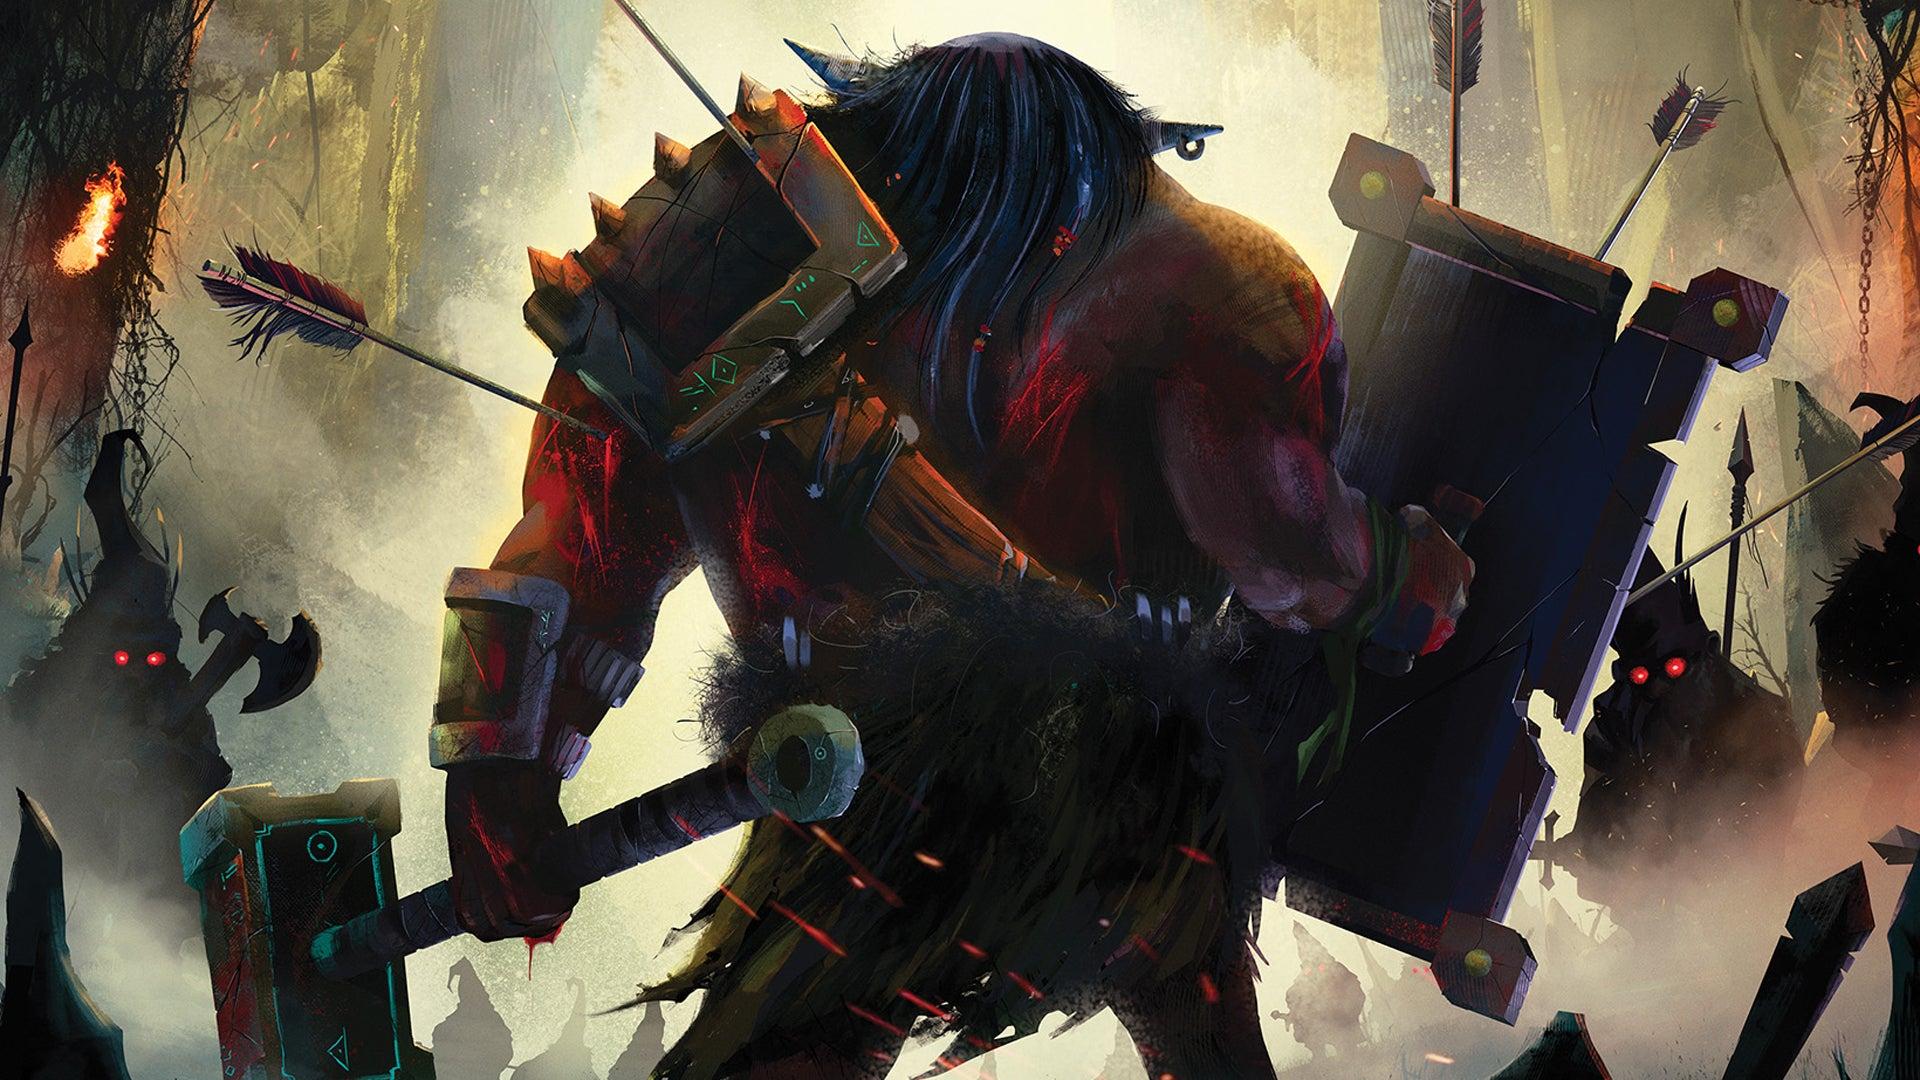 Fall of the Mountain King artwork